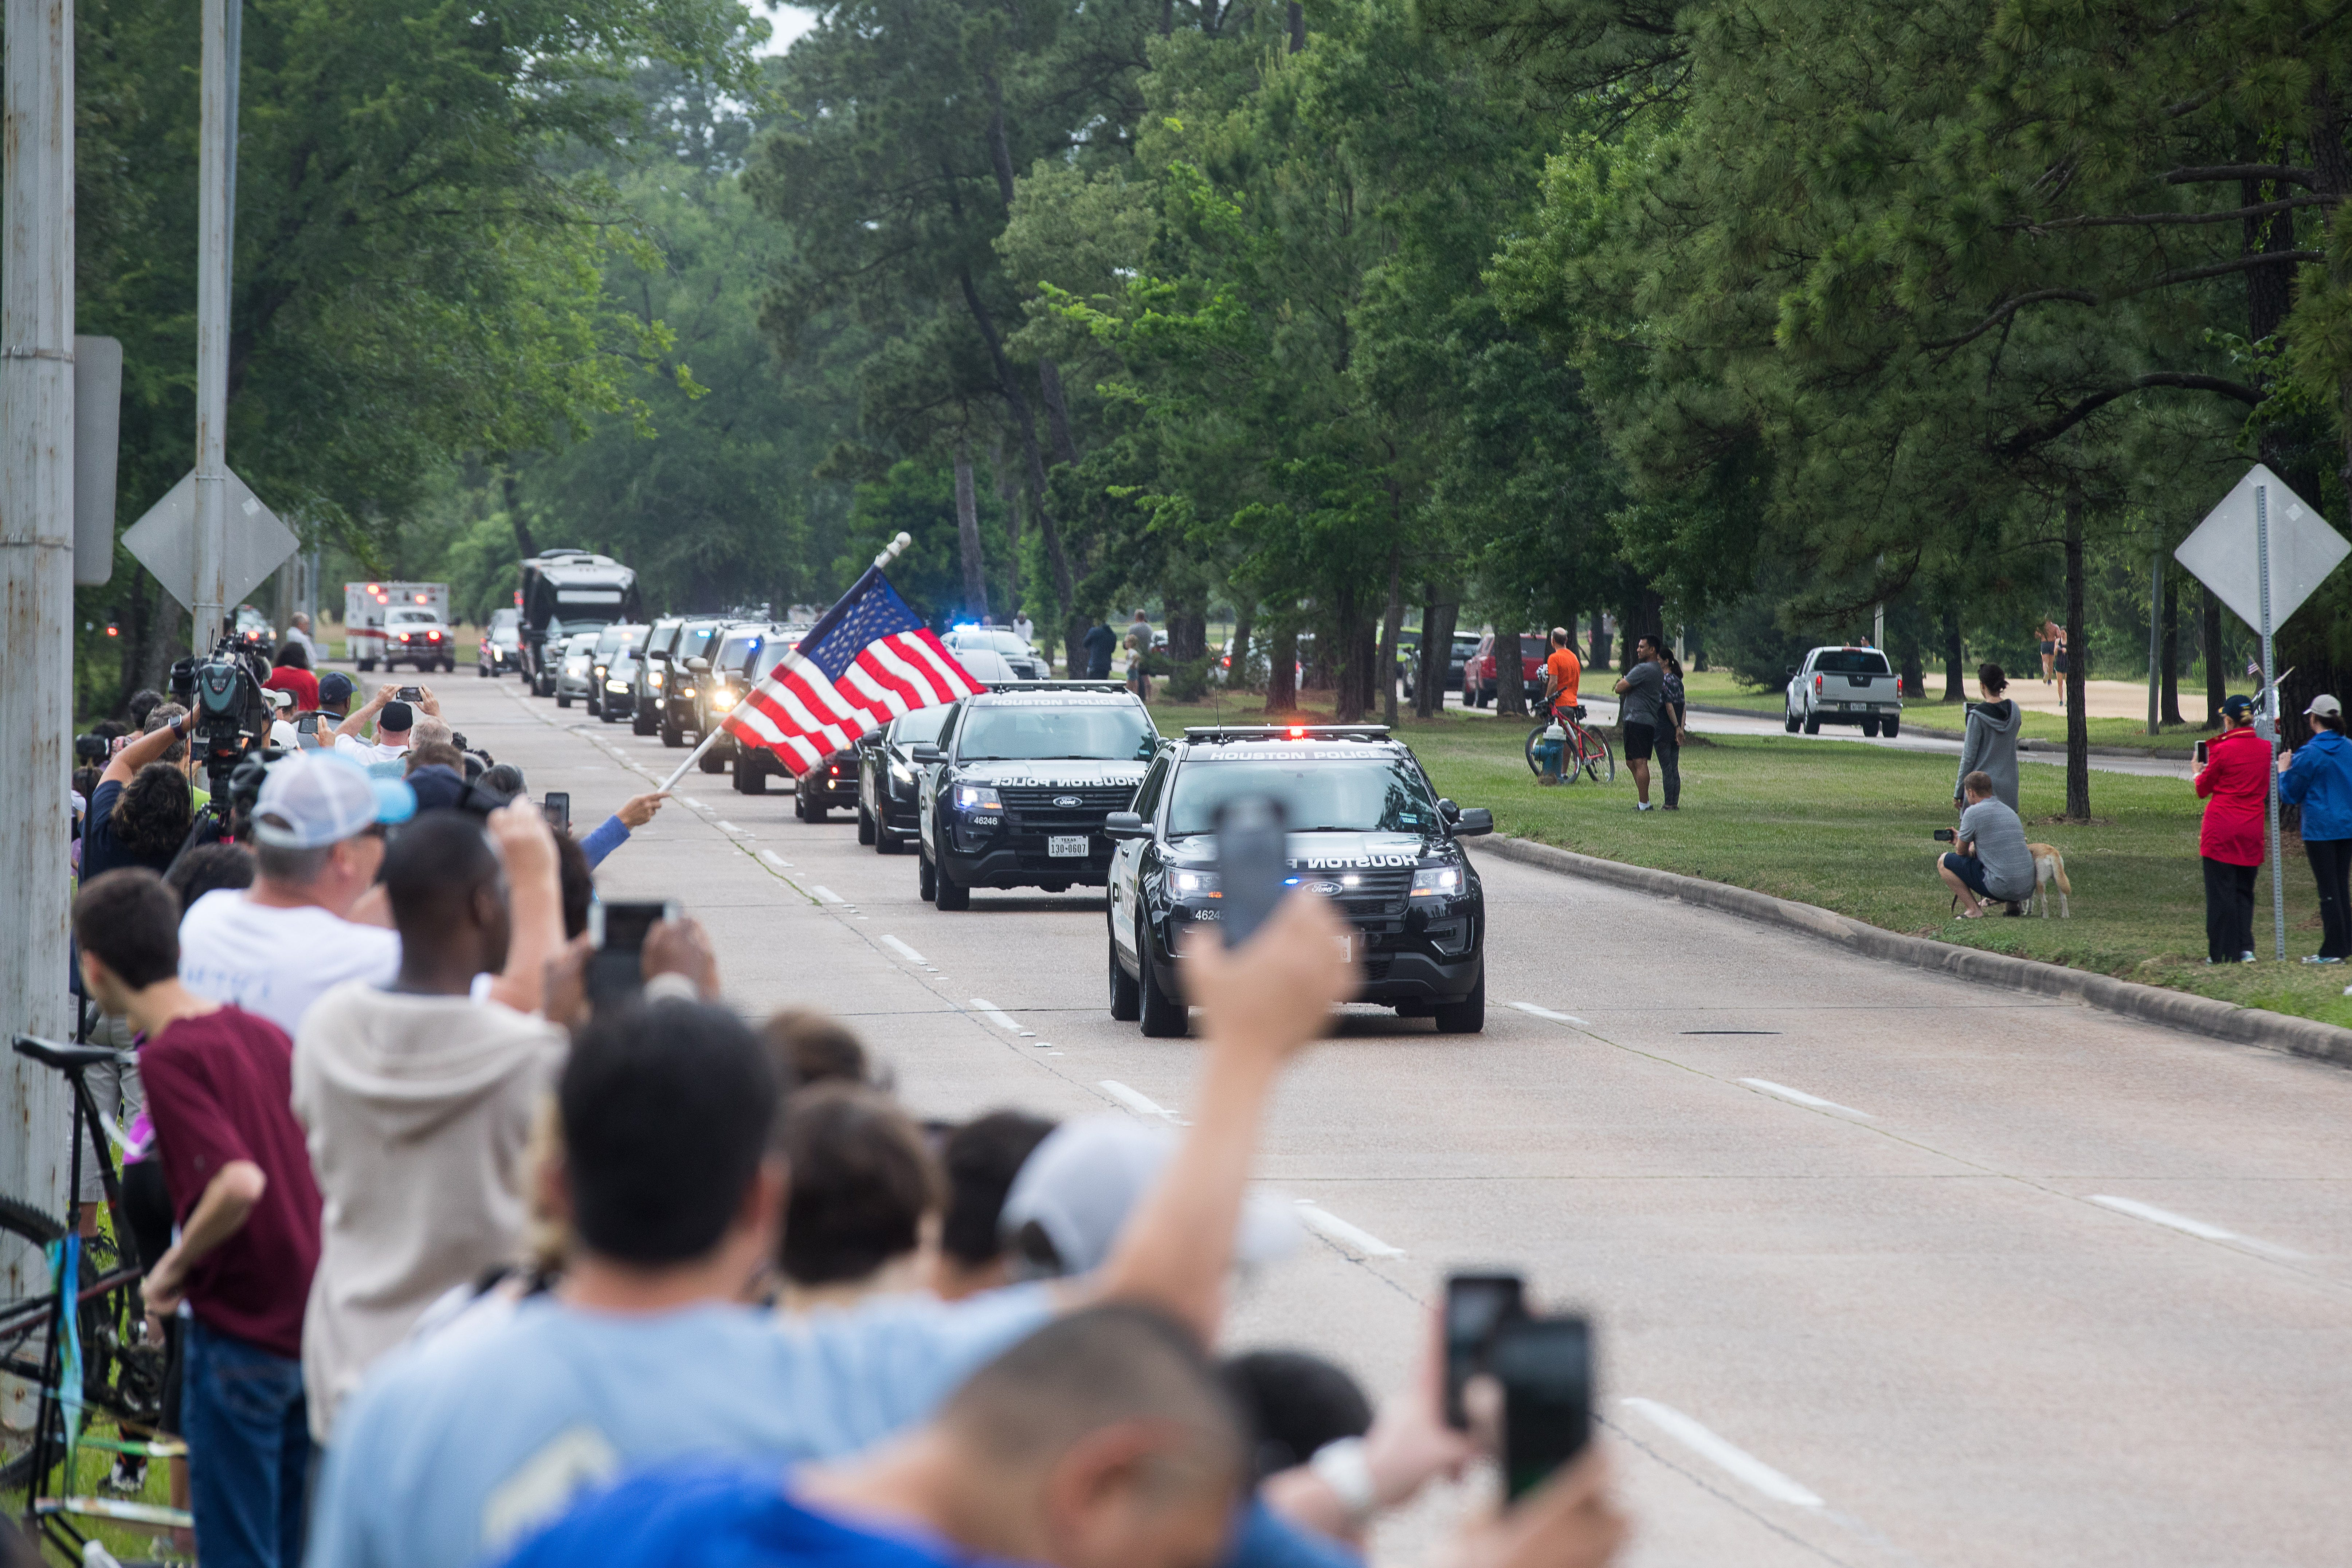 Texas says goodbye to former first lady Barbara Bush   El Paso Times